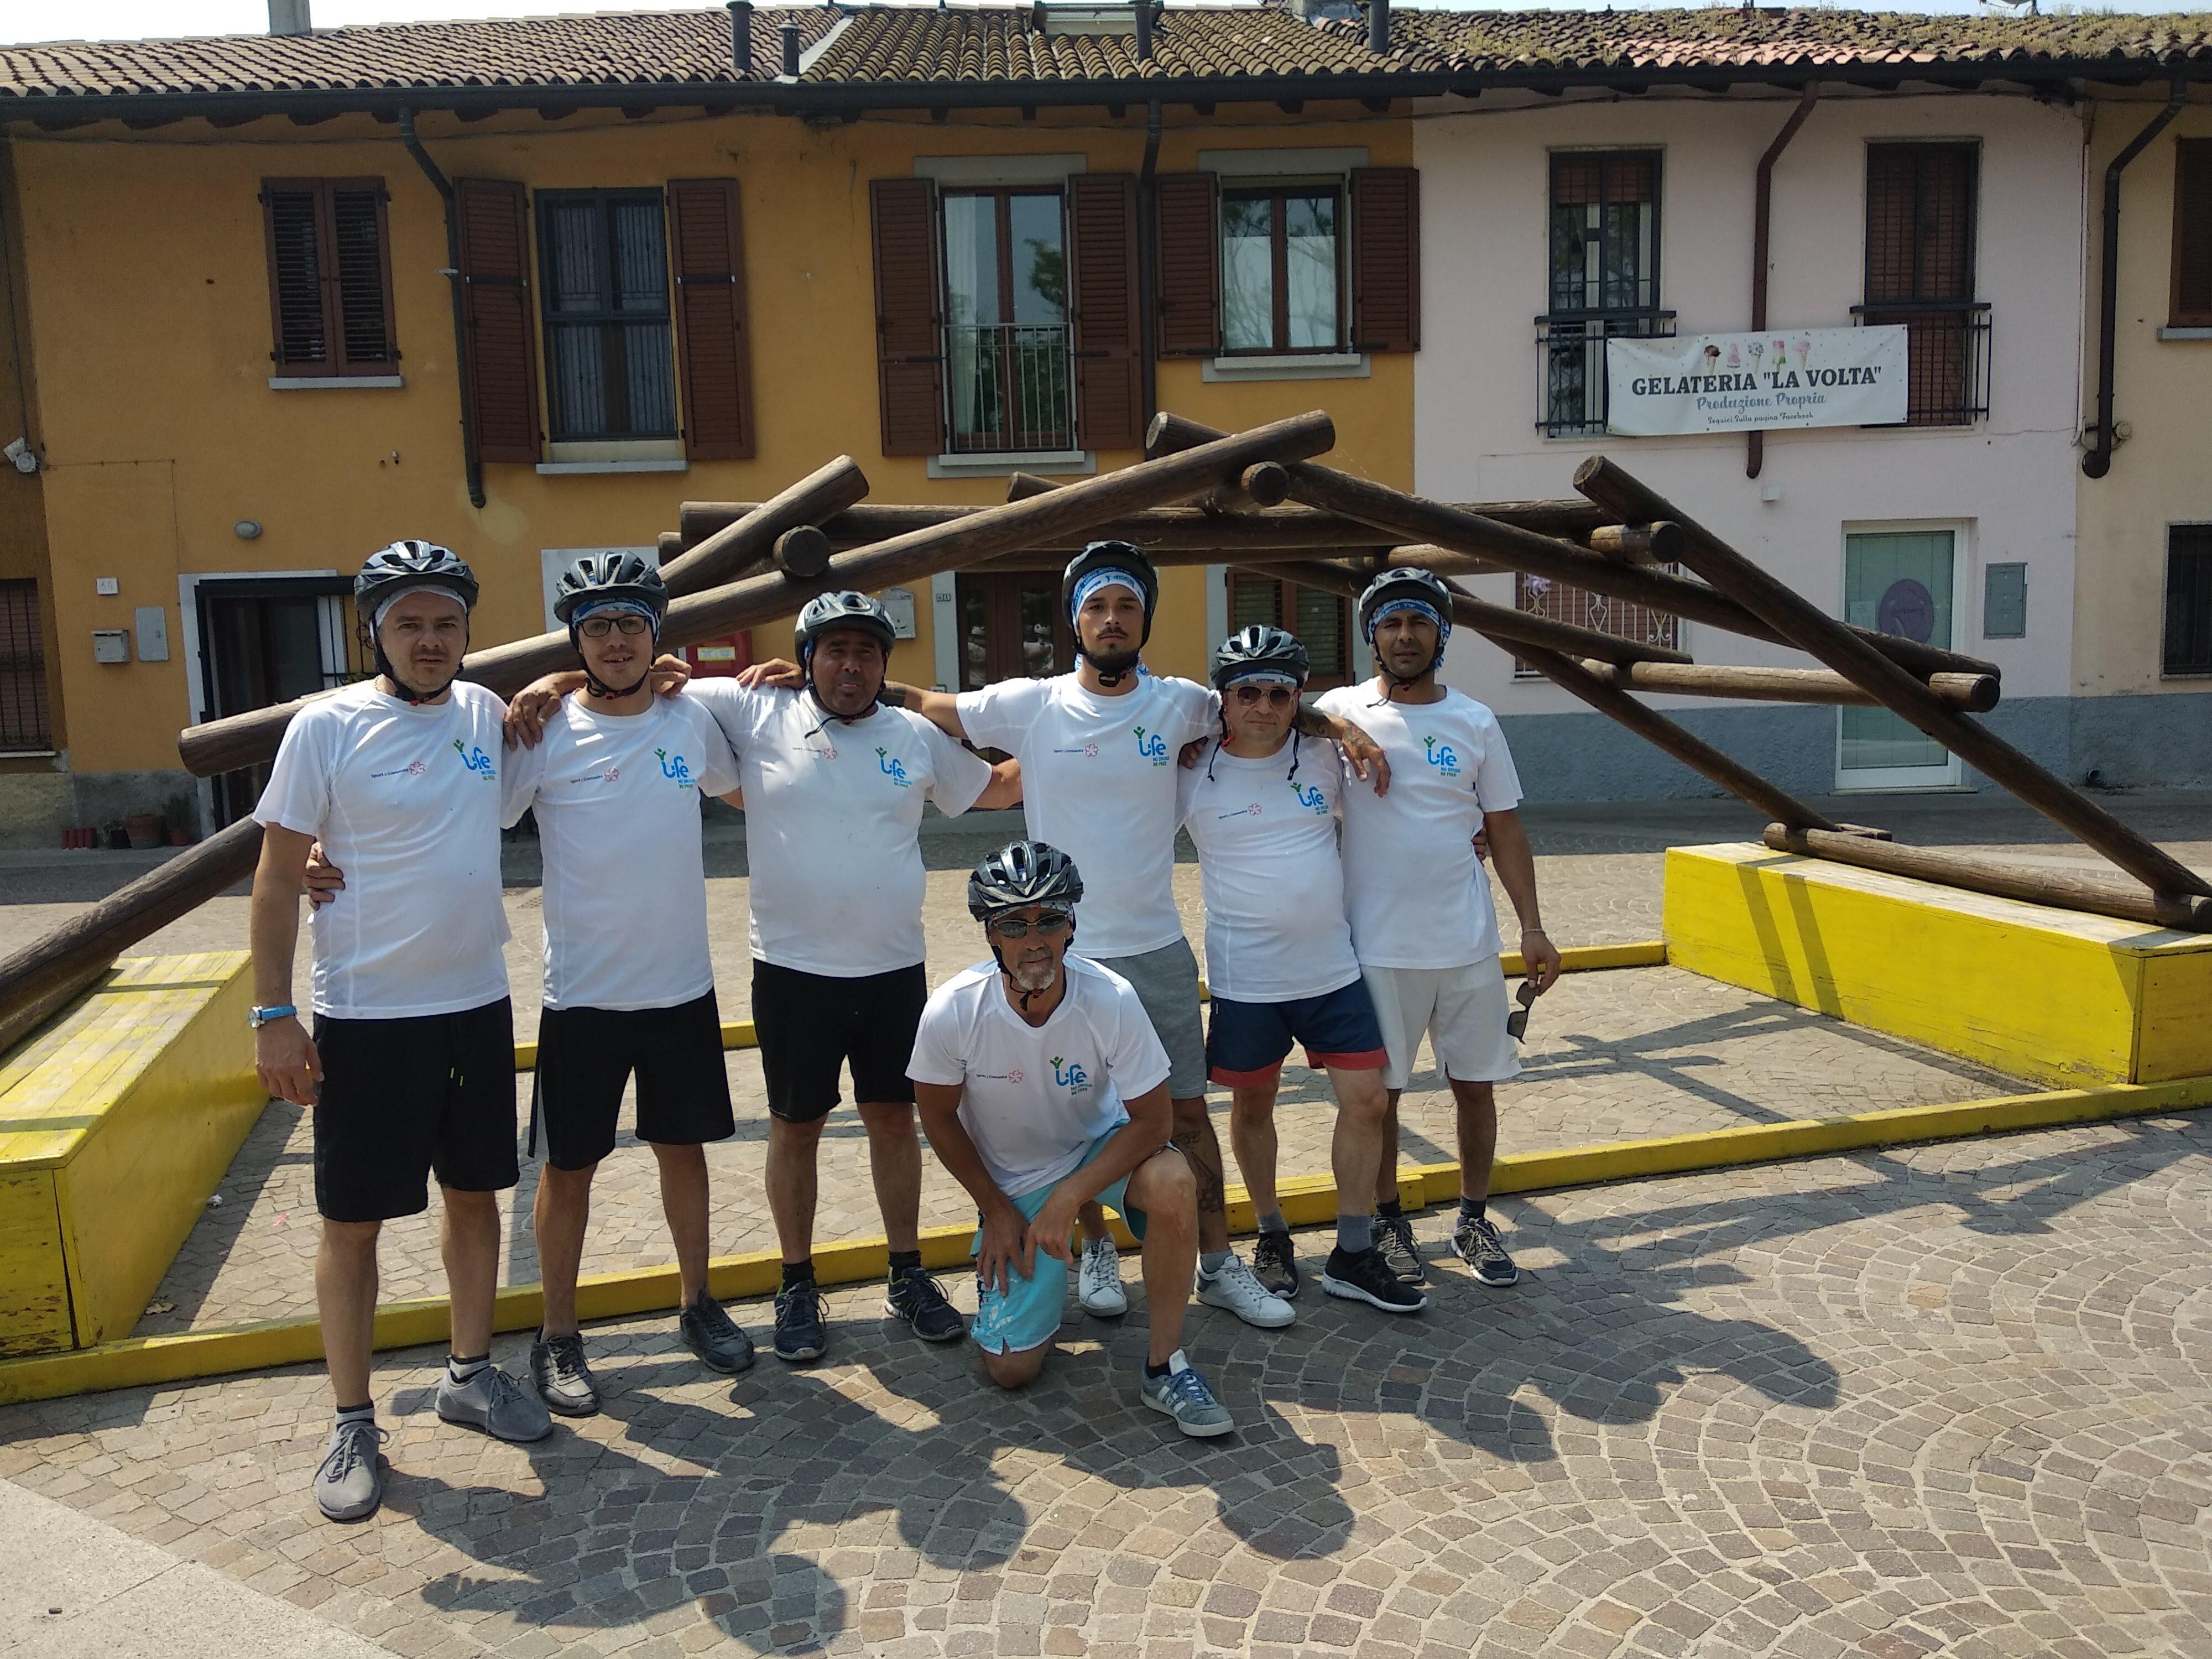 Lombardia 21 tappa – Kairos e Fontane – da Cisano a Lodi